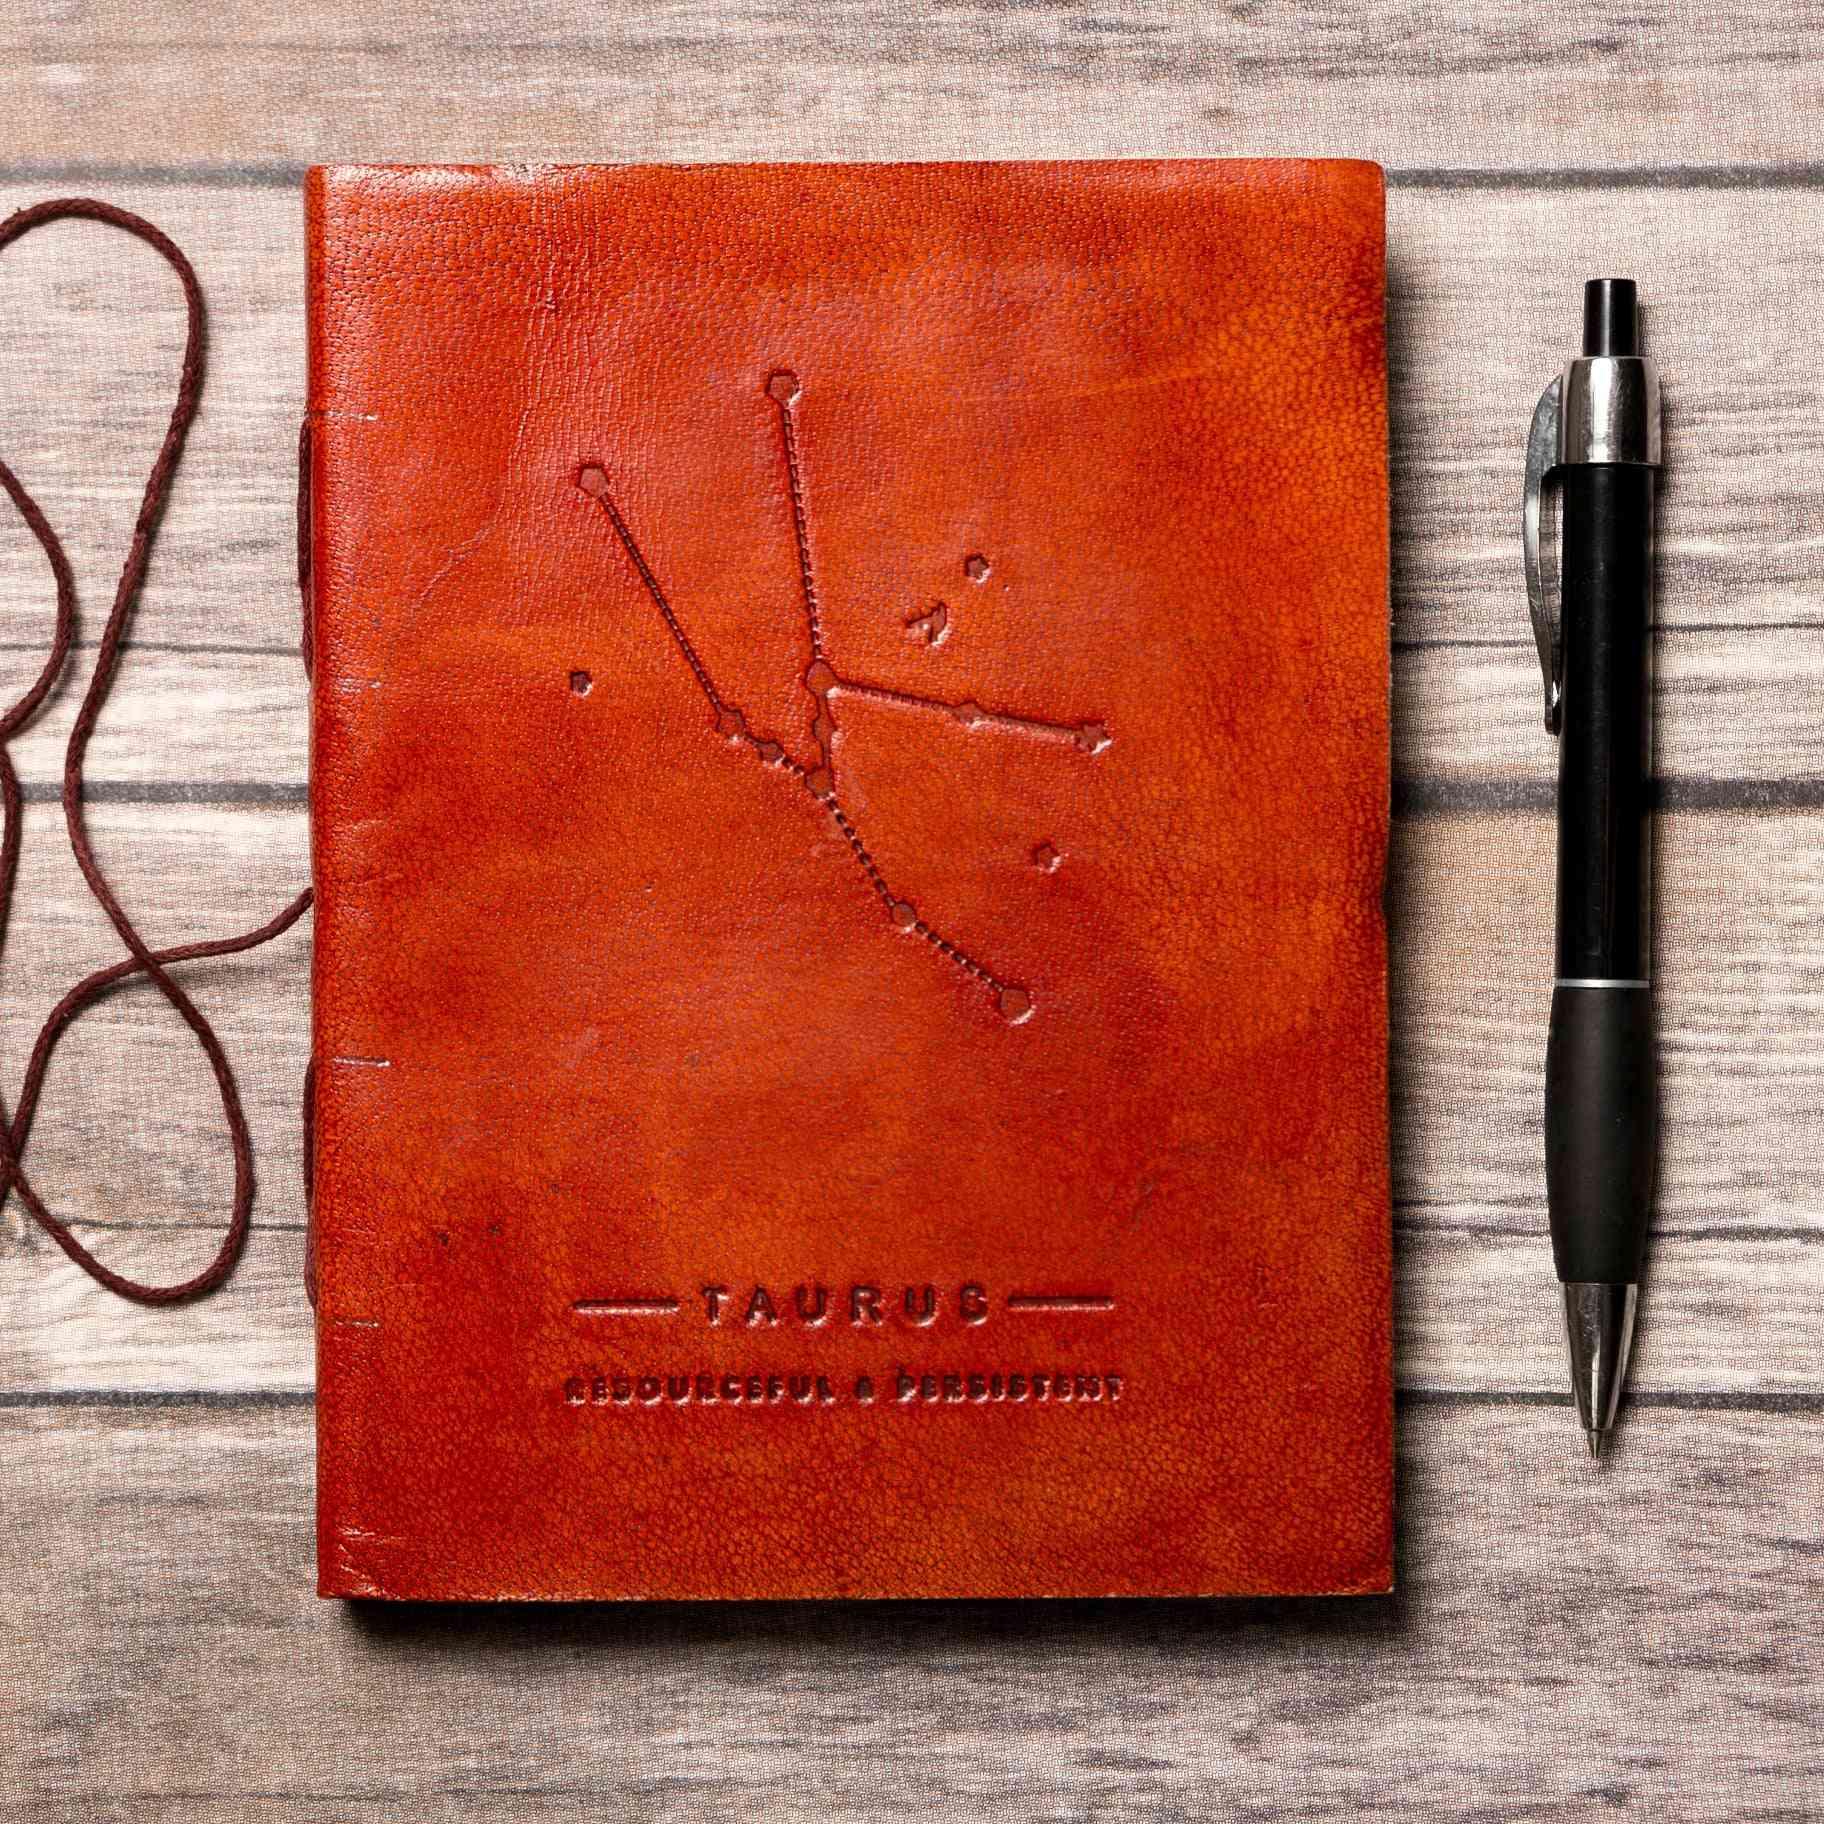 Taurus Zodiac Symbol Embossed Genuine Leather Journal